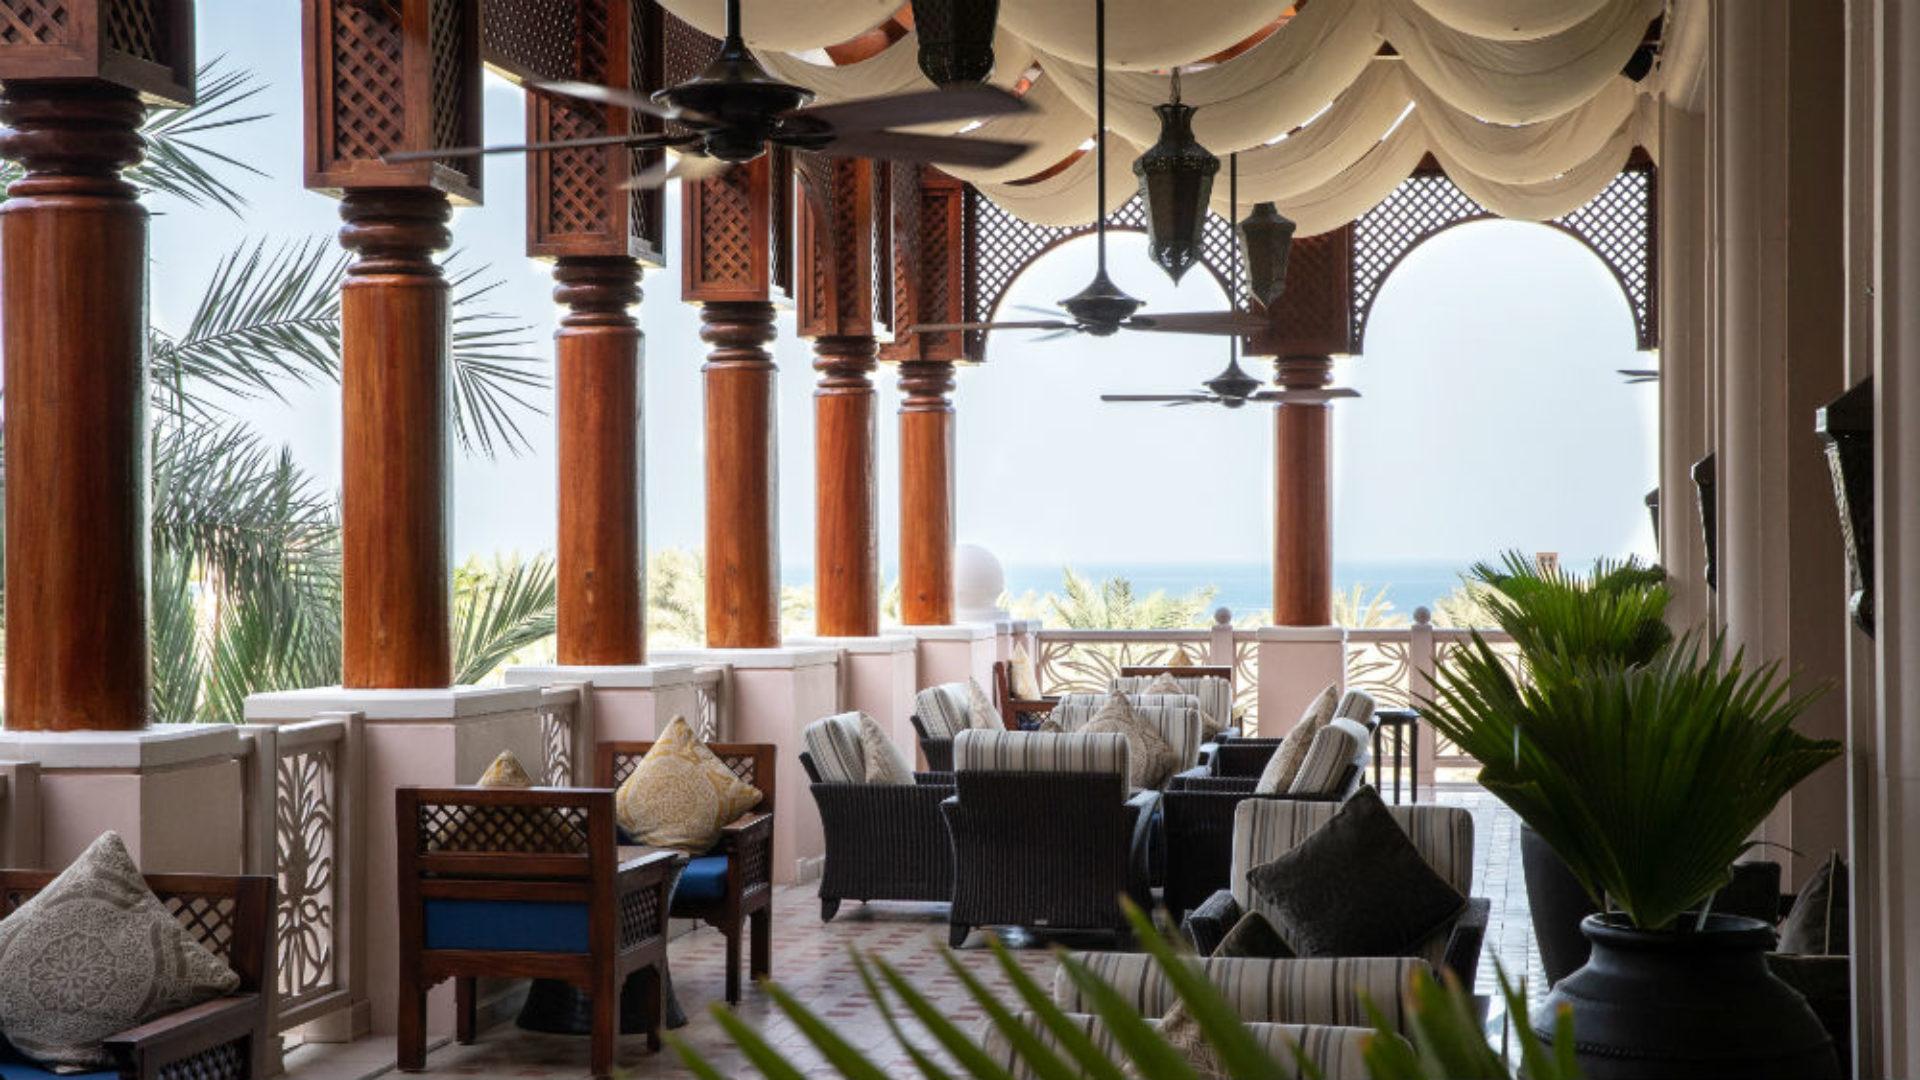 Al Fayrooz Lounge at the Jumeirah Al Qasr